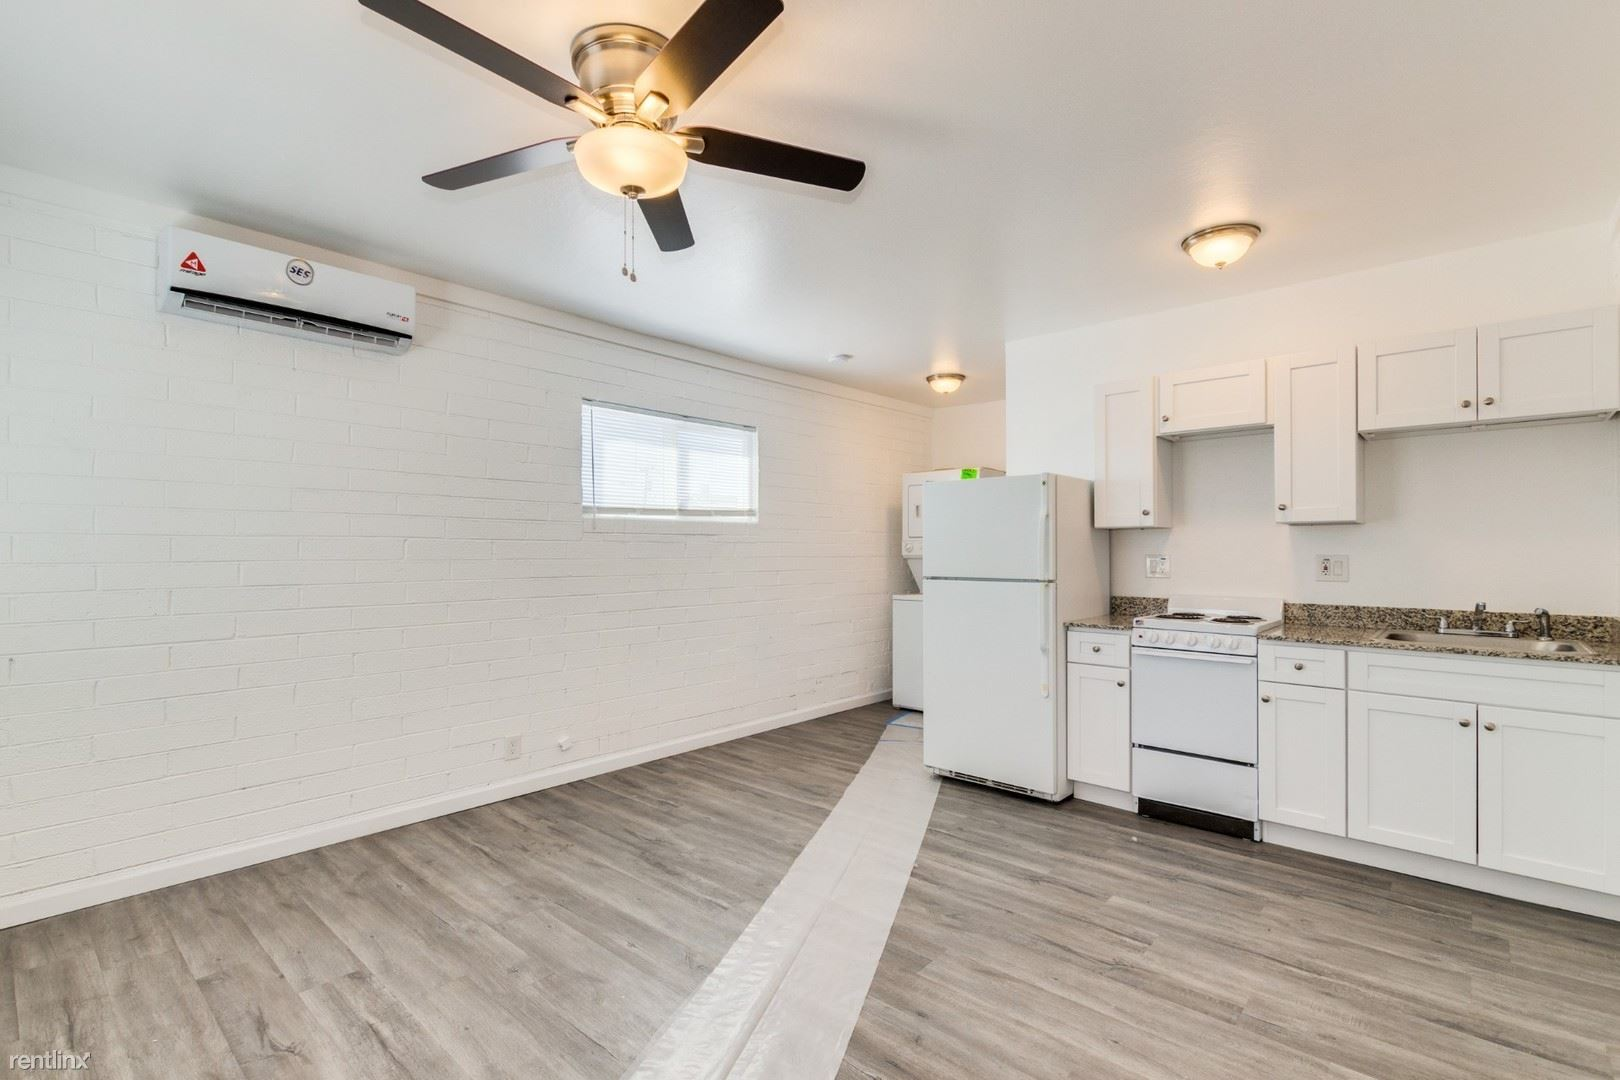 2402 N 24th St # 1, Phoenix, AZ - $825